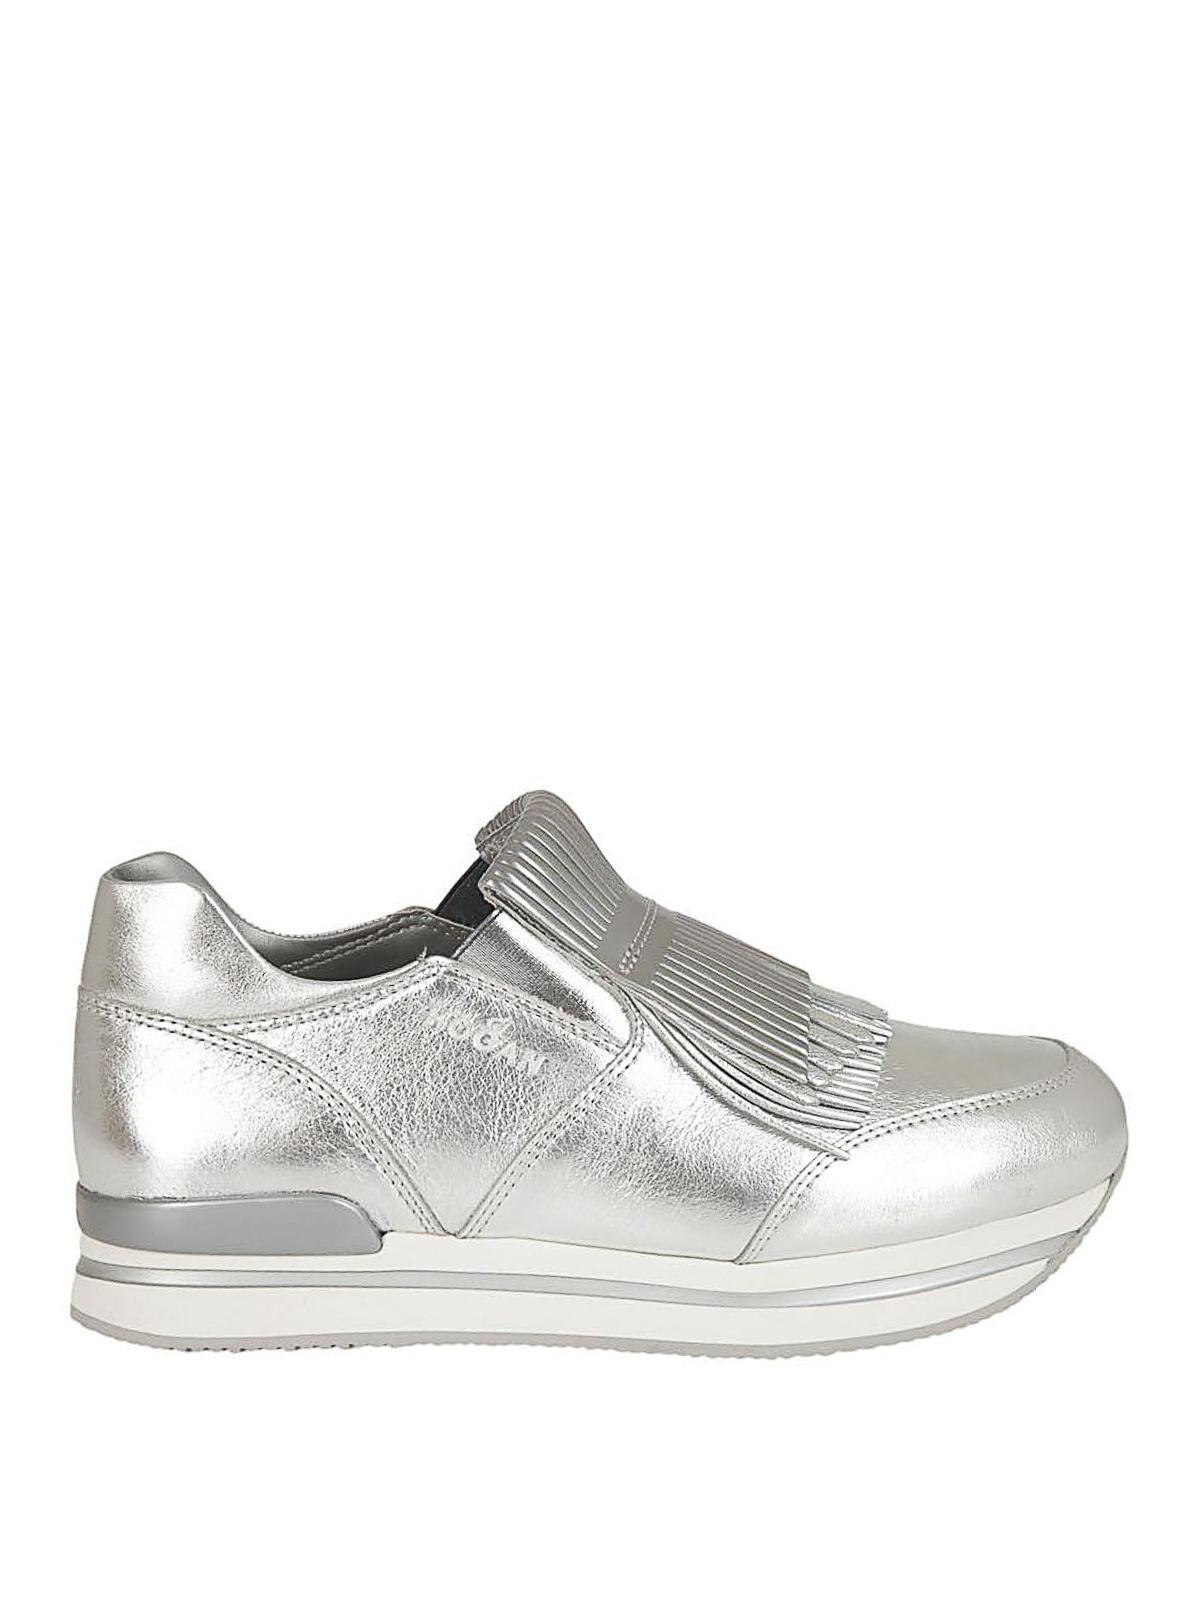 Sneakers Hogan - Slip-on H222 argento con frange - HXW2220AH80IZDB200